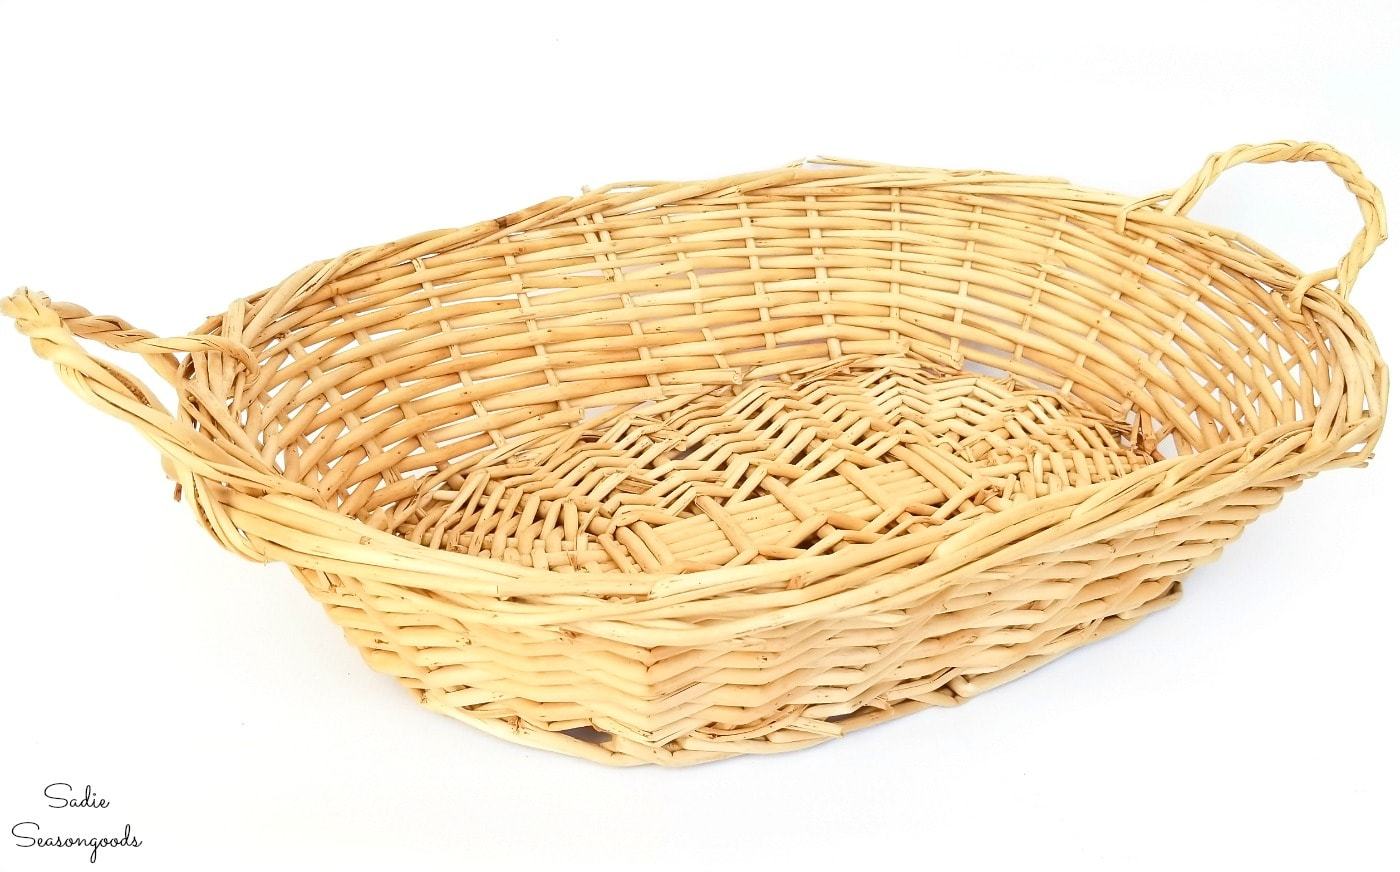 Painting a basket to look like the Carolina Panthers stadium